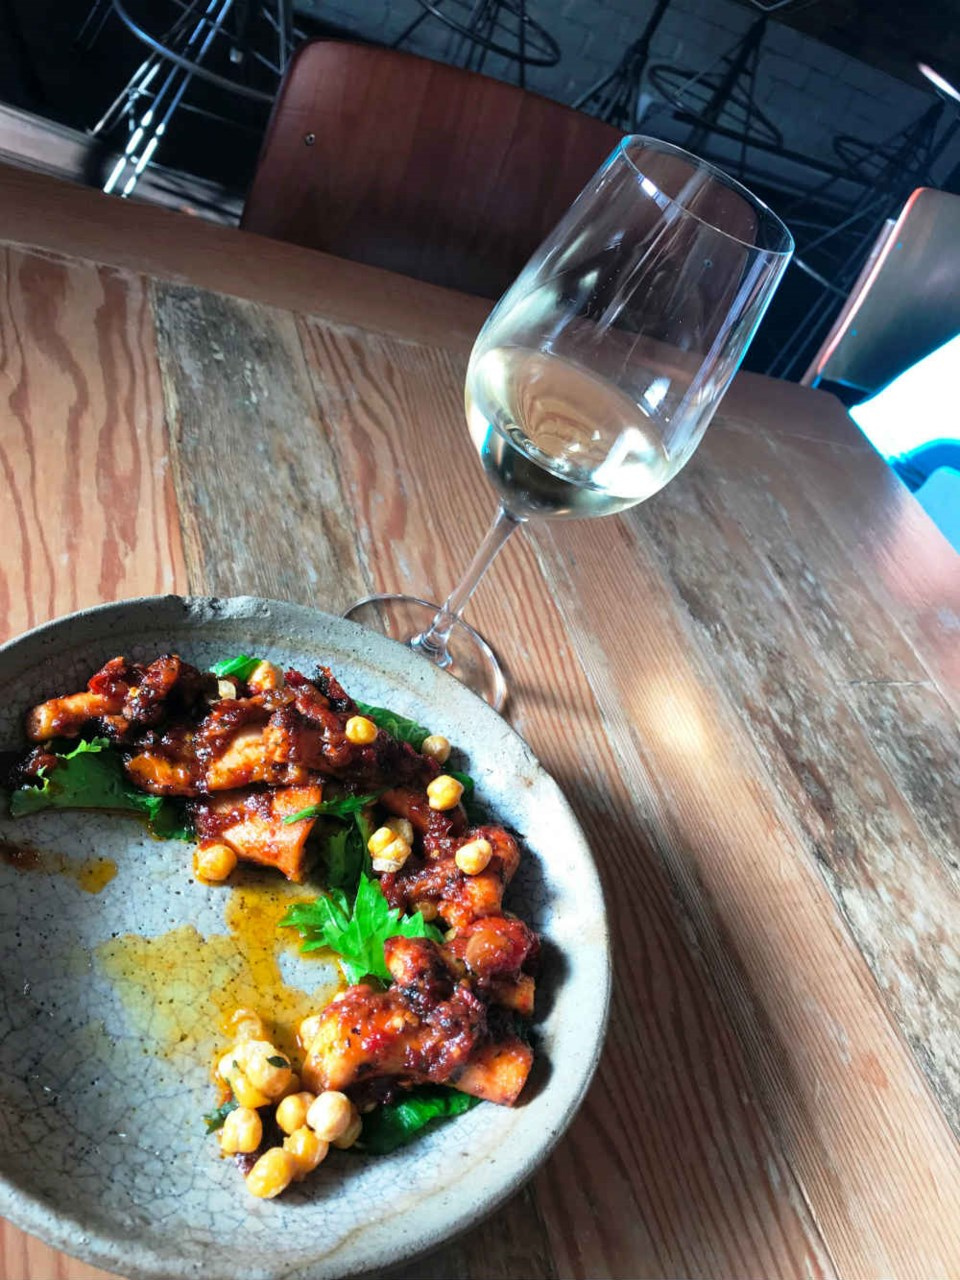 Spicy octopus at Burdock & Co. Photo Sandra Thomas